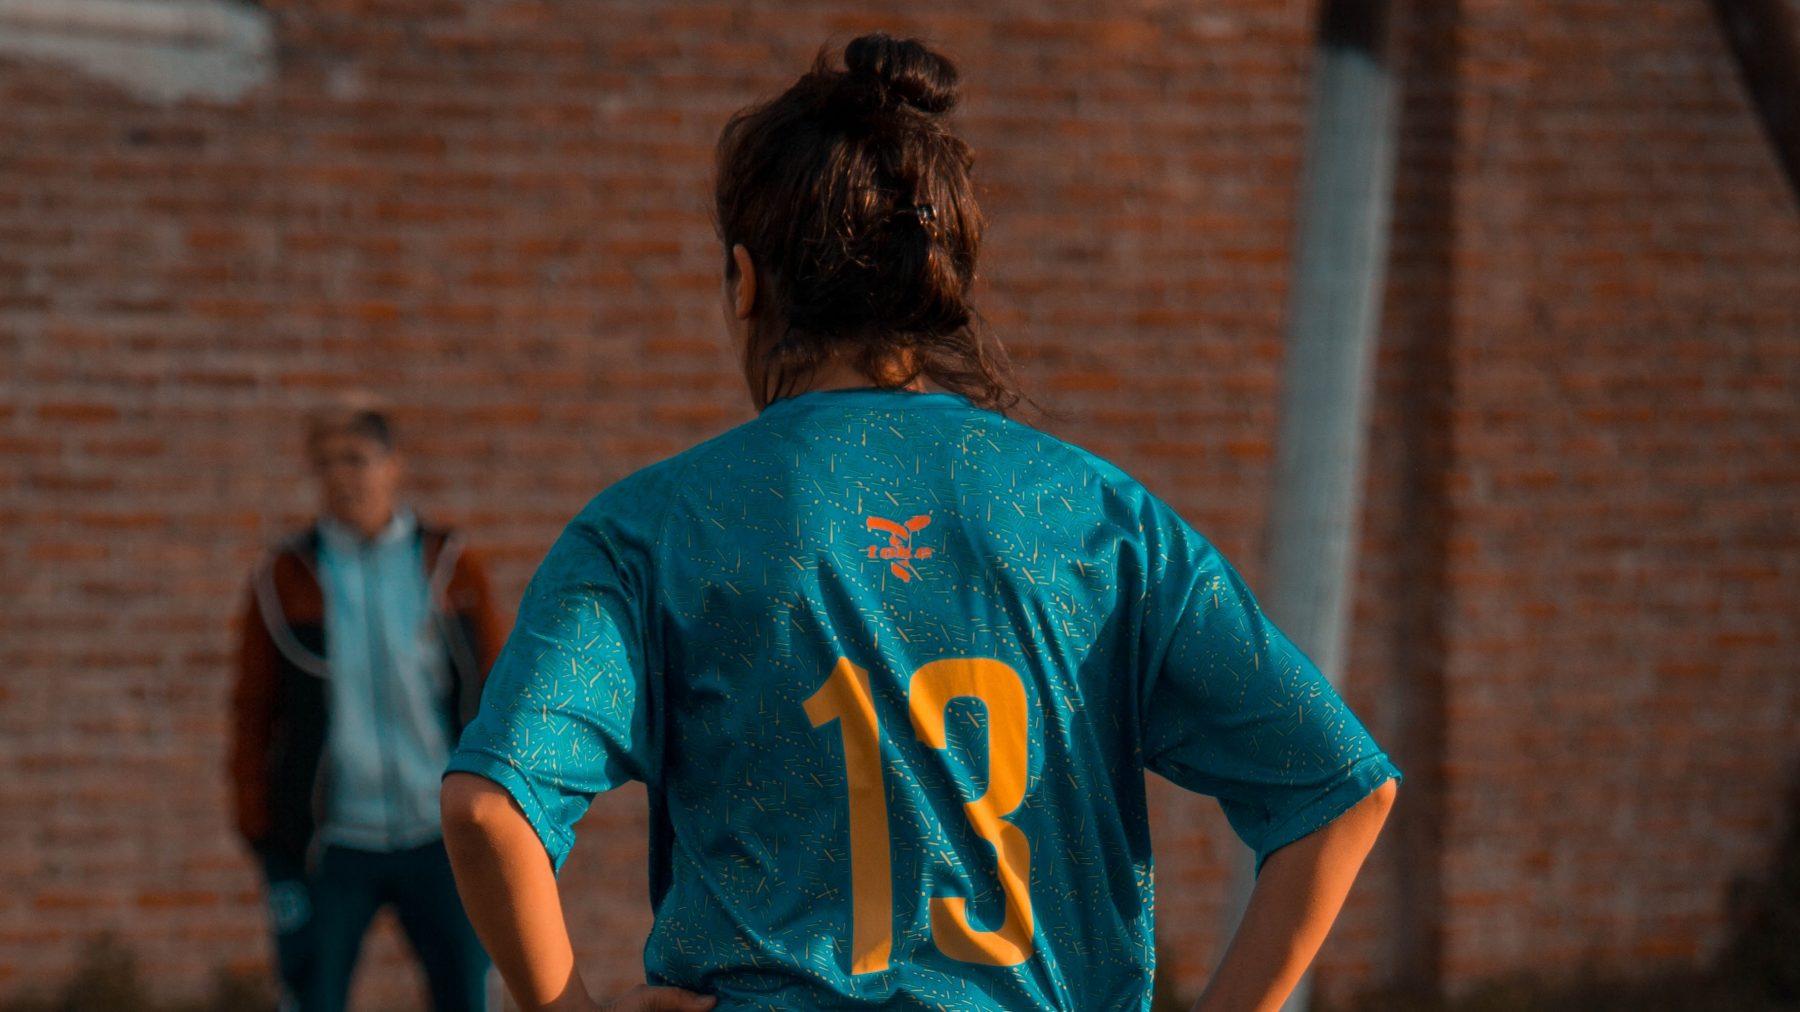 iran iraanse voetbalsupporters vrouwen illegaal